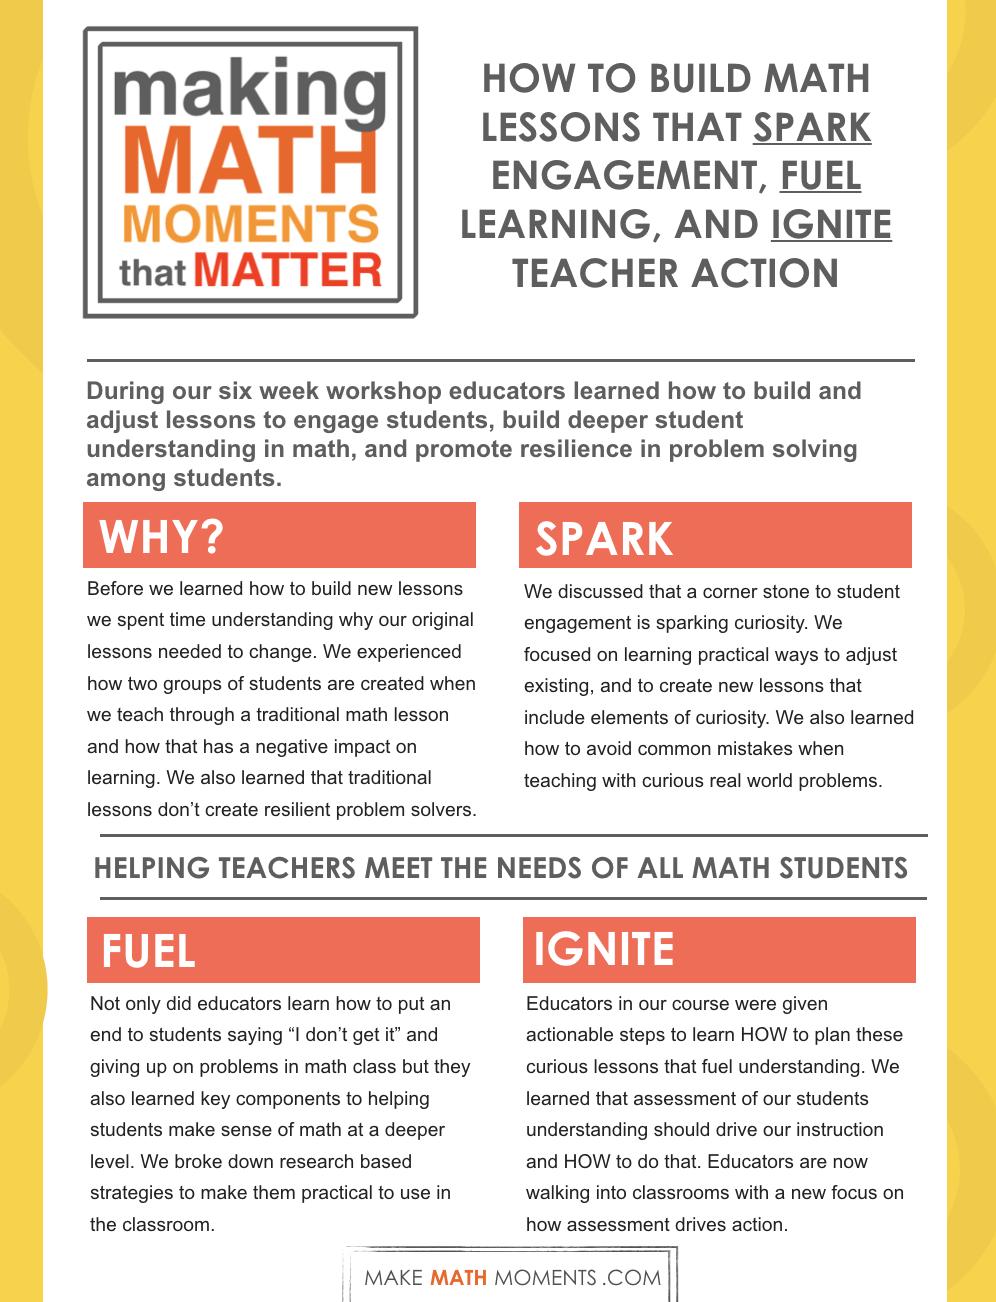 Making Math Moments That Matter Online Workshop - Lesson4